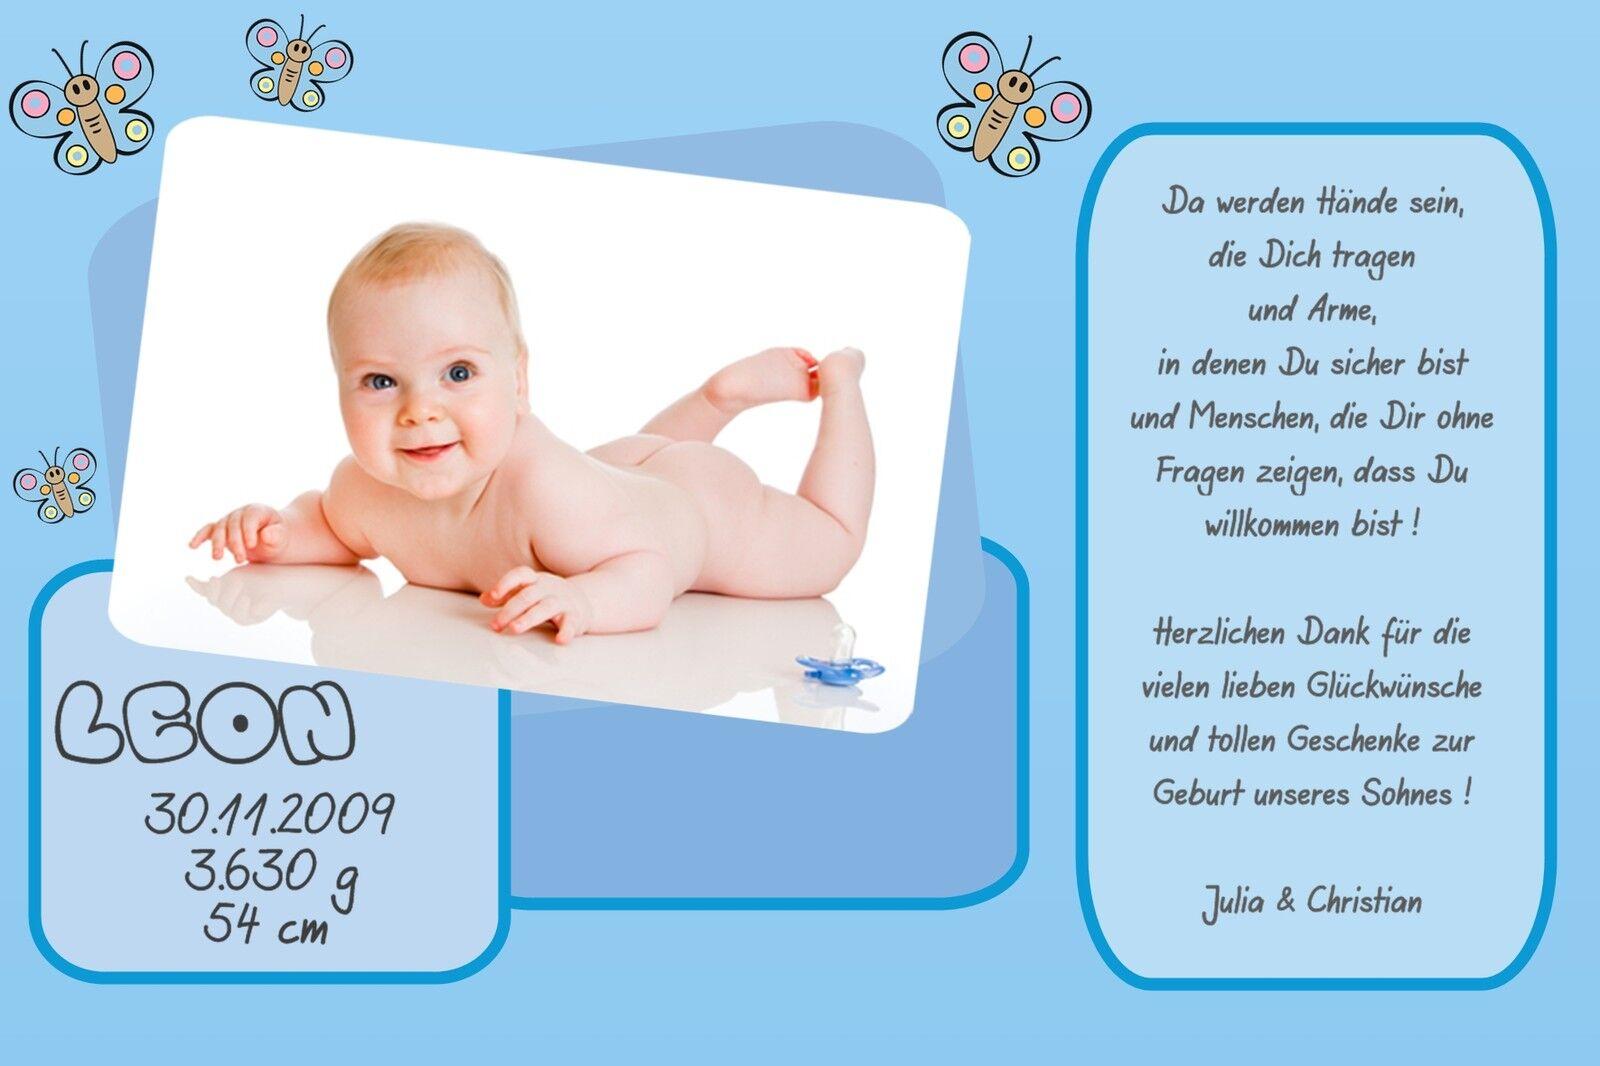 Danksagung Karte Geburt Baby Danksagungskarten individuell persönlich gb_34   | Sonderangebot  | Erste Klasse in seiner Klasse